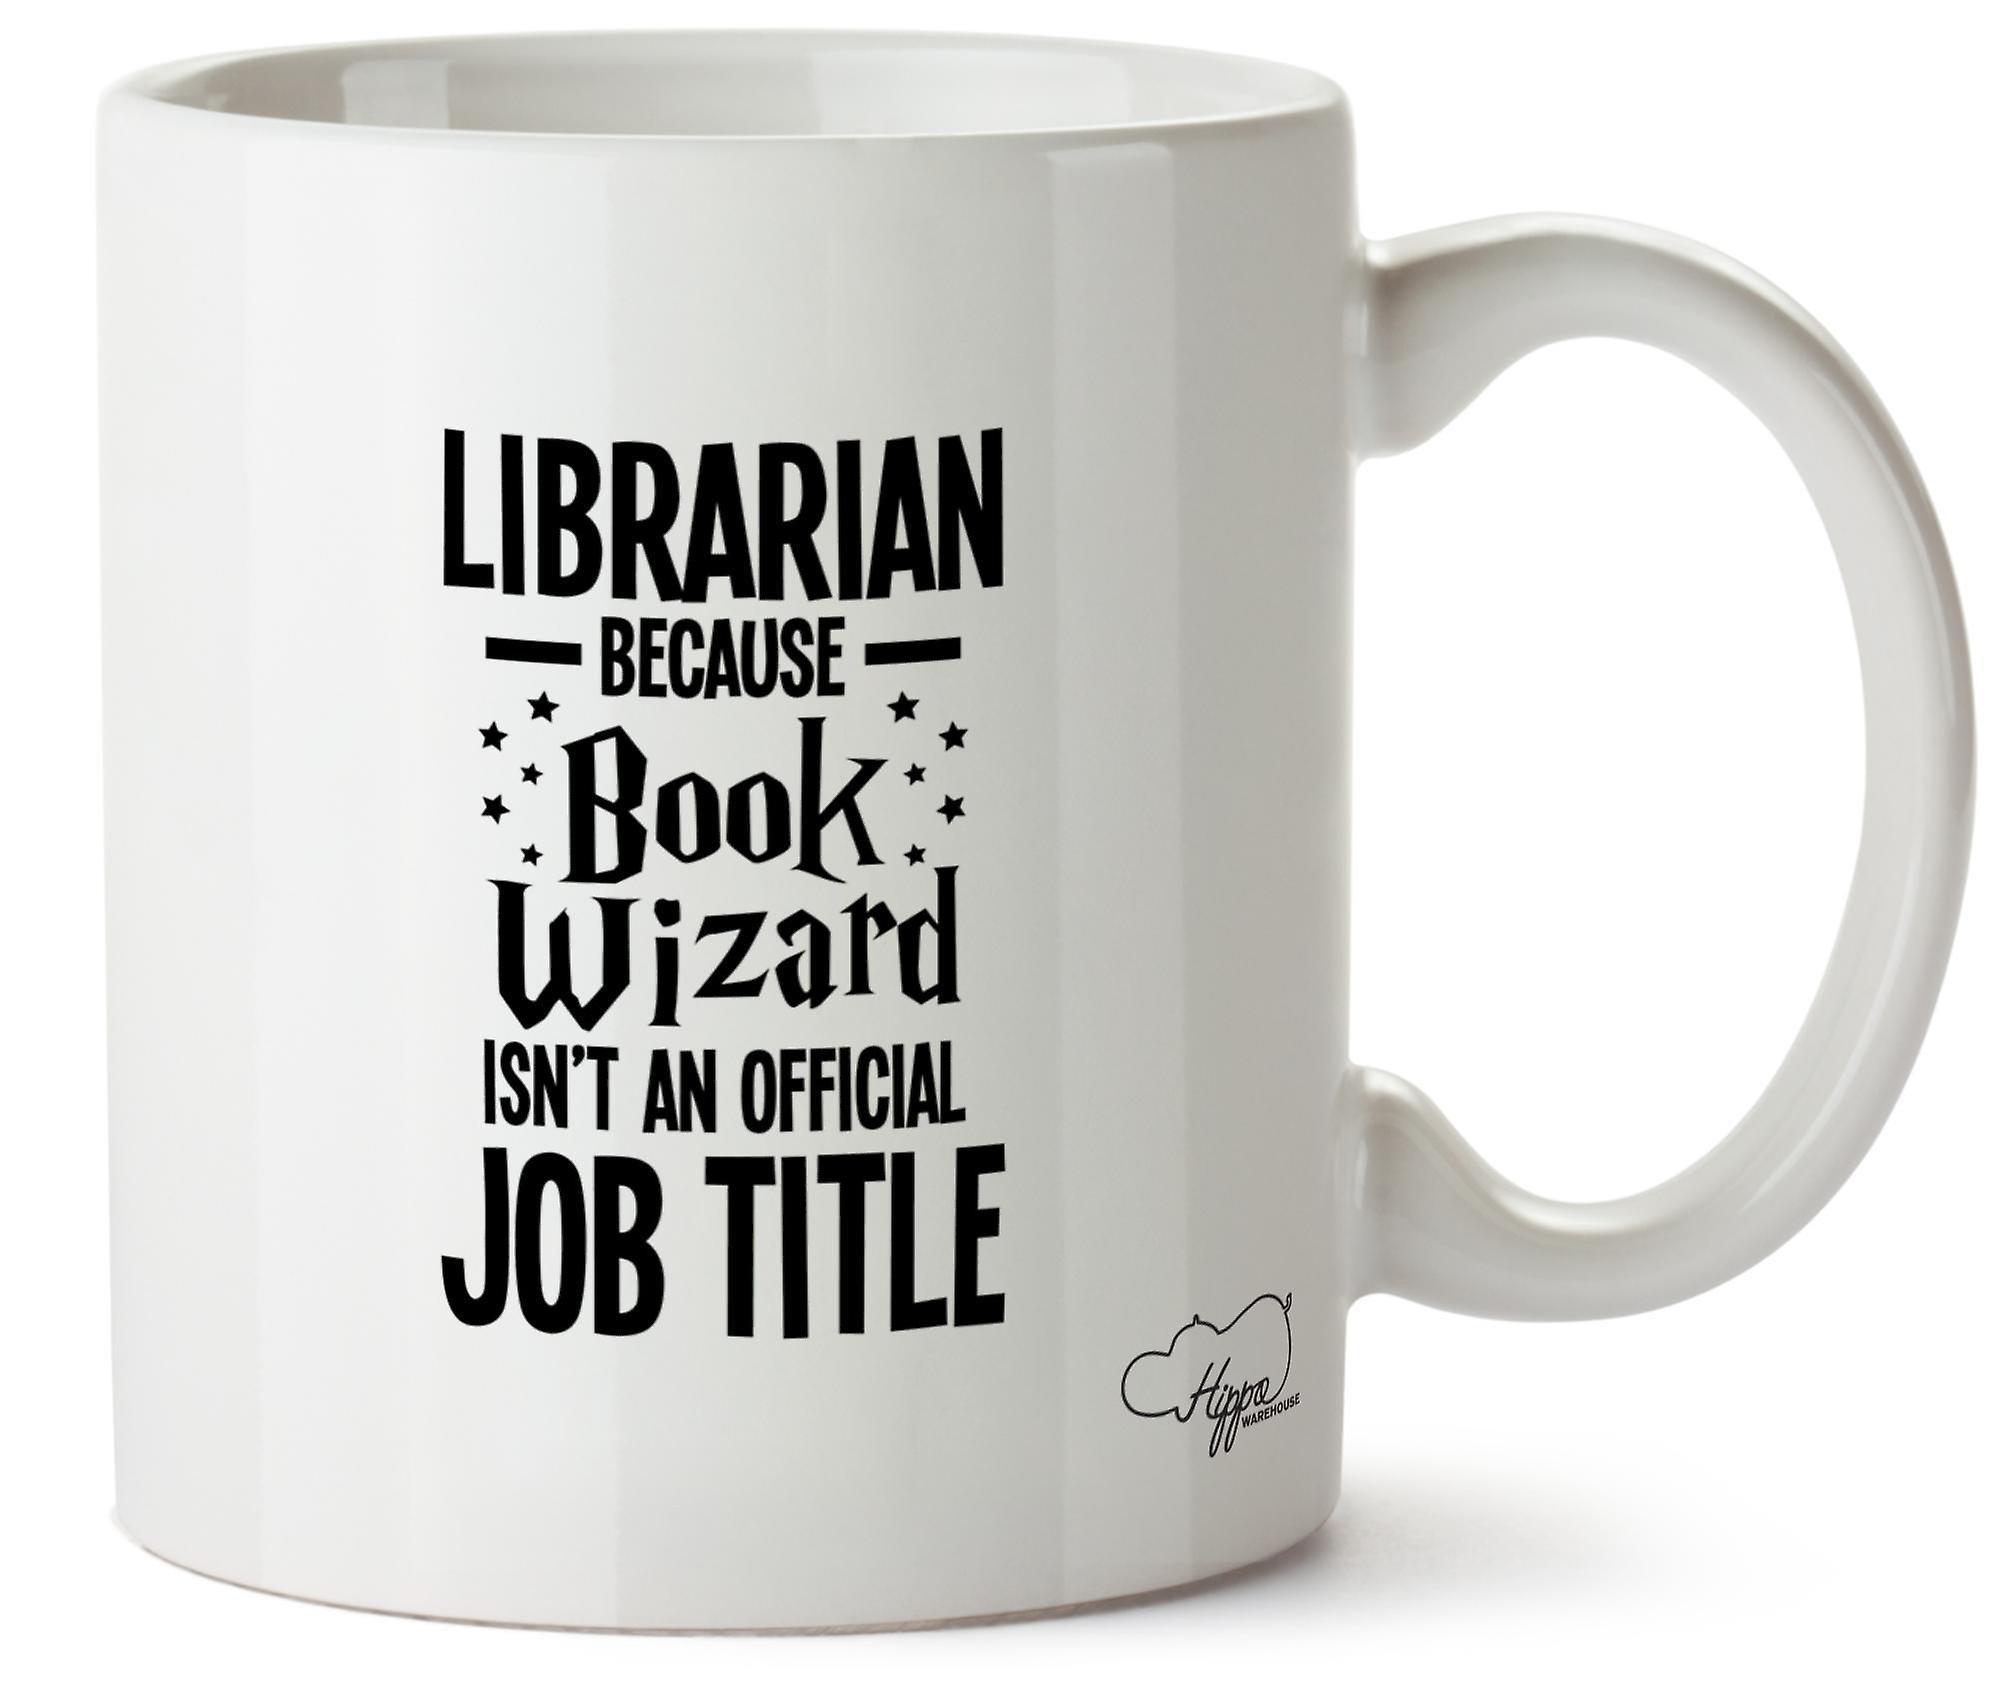 Hippowarehouse Librarian Because Book Wizard Isn't An Official Job Title Printed Mug Cup Ceramic 10oz